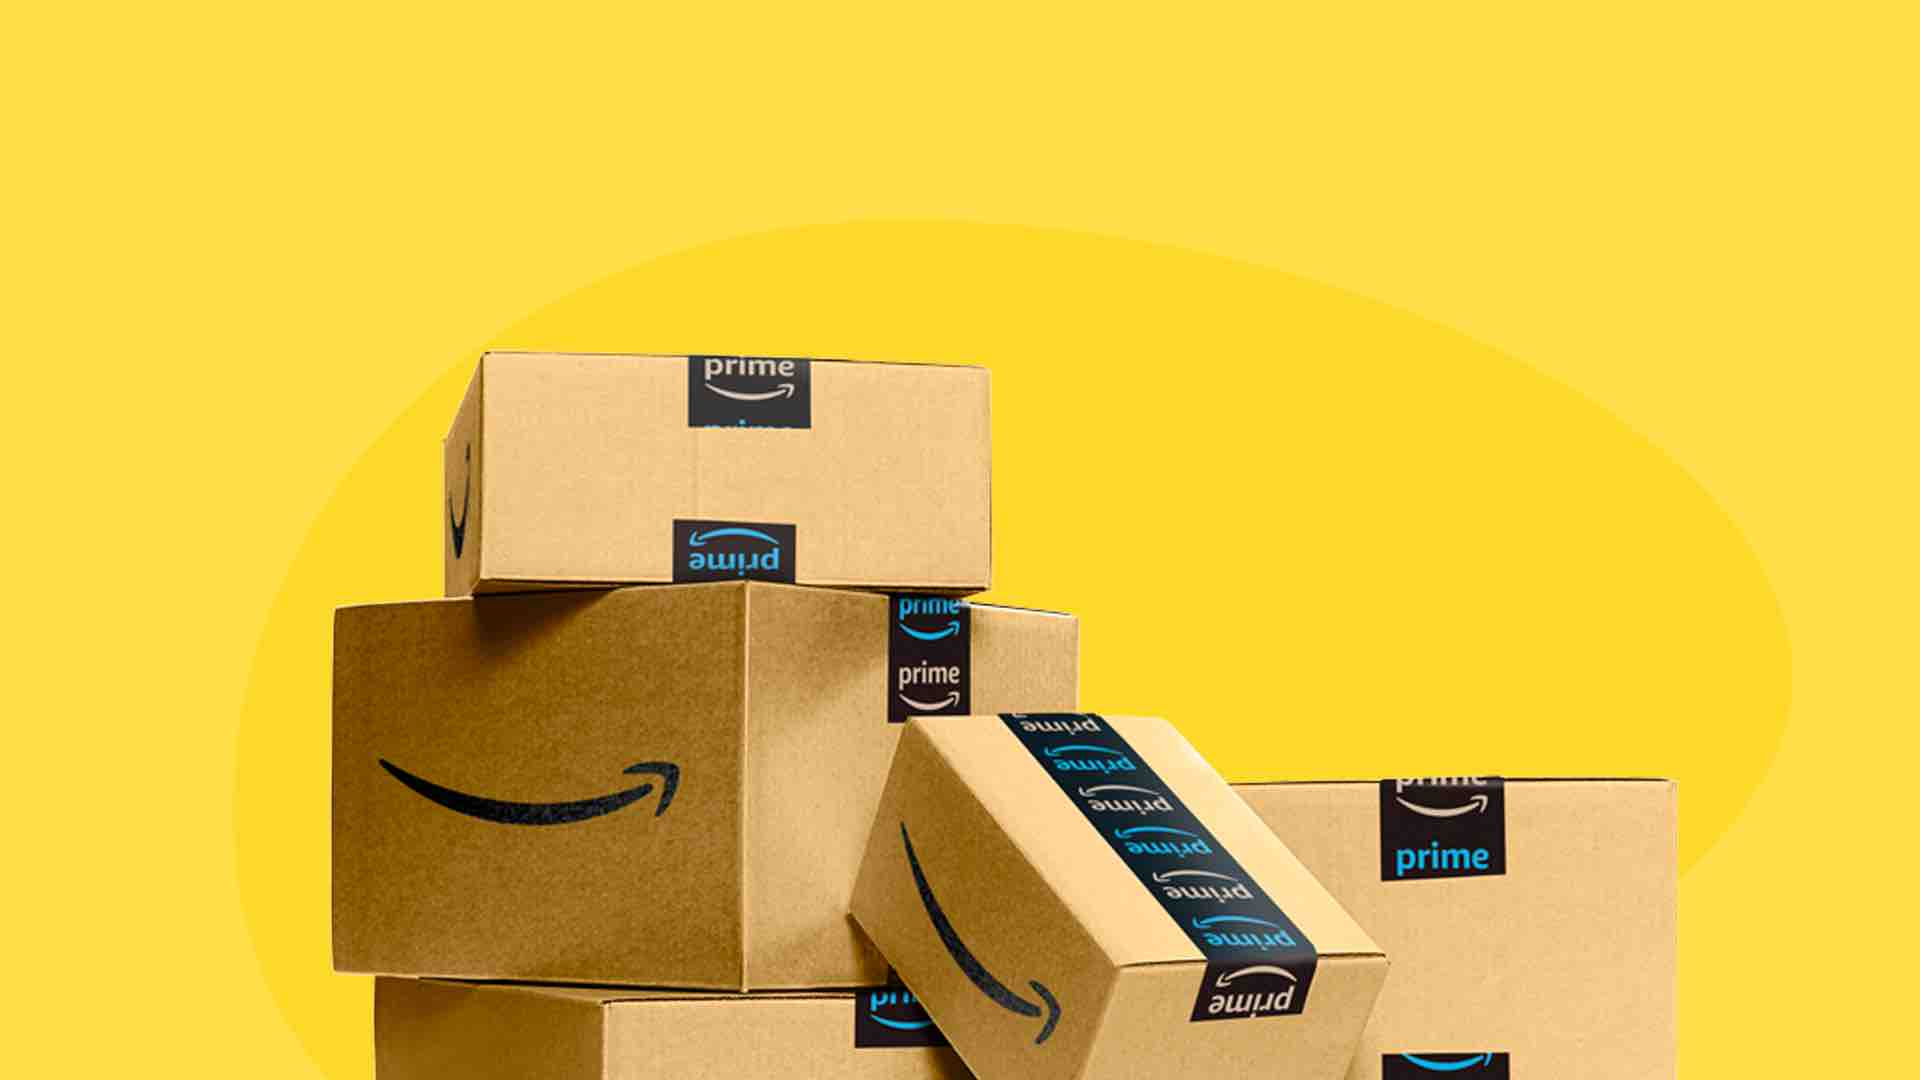 Amazon - Company Forensics